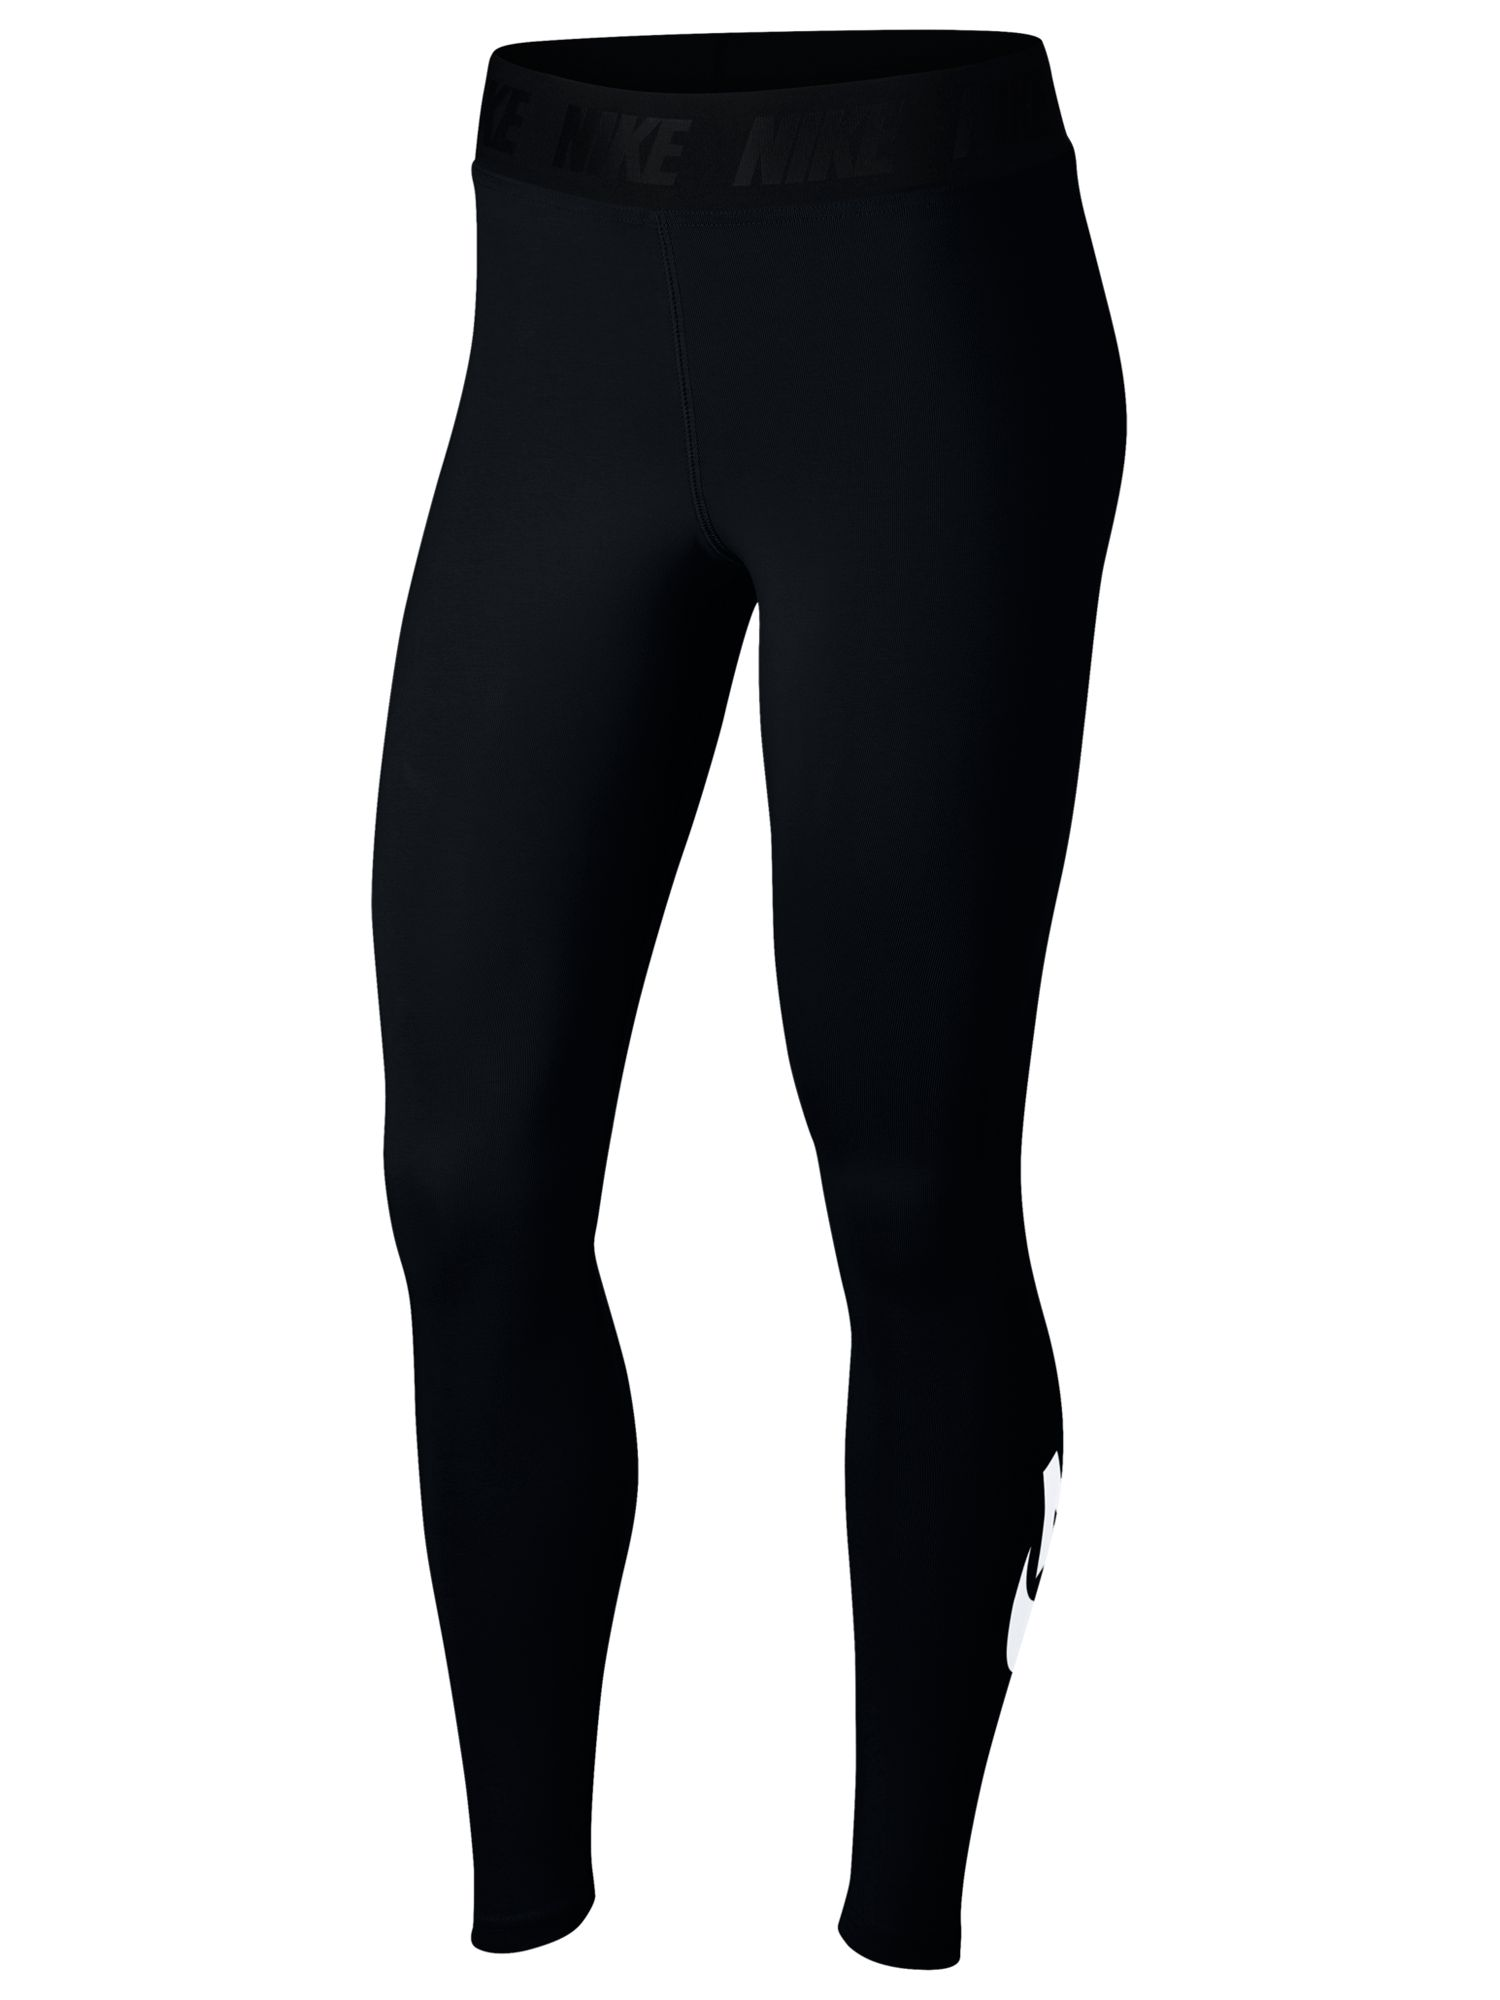 ce85b29eec70f Nike Sportswear Leg-A-See Leggings at John Lewis & Partners